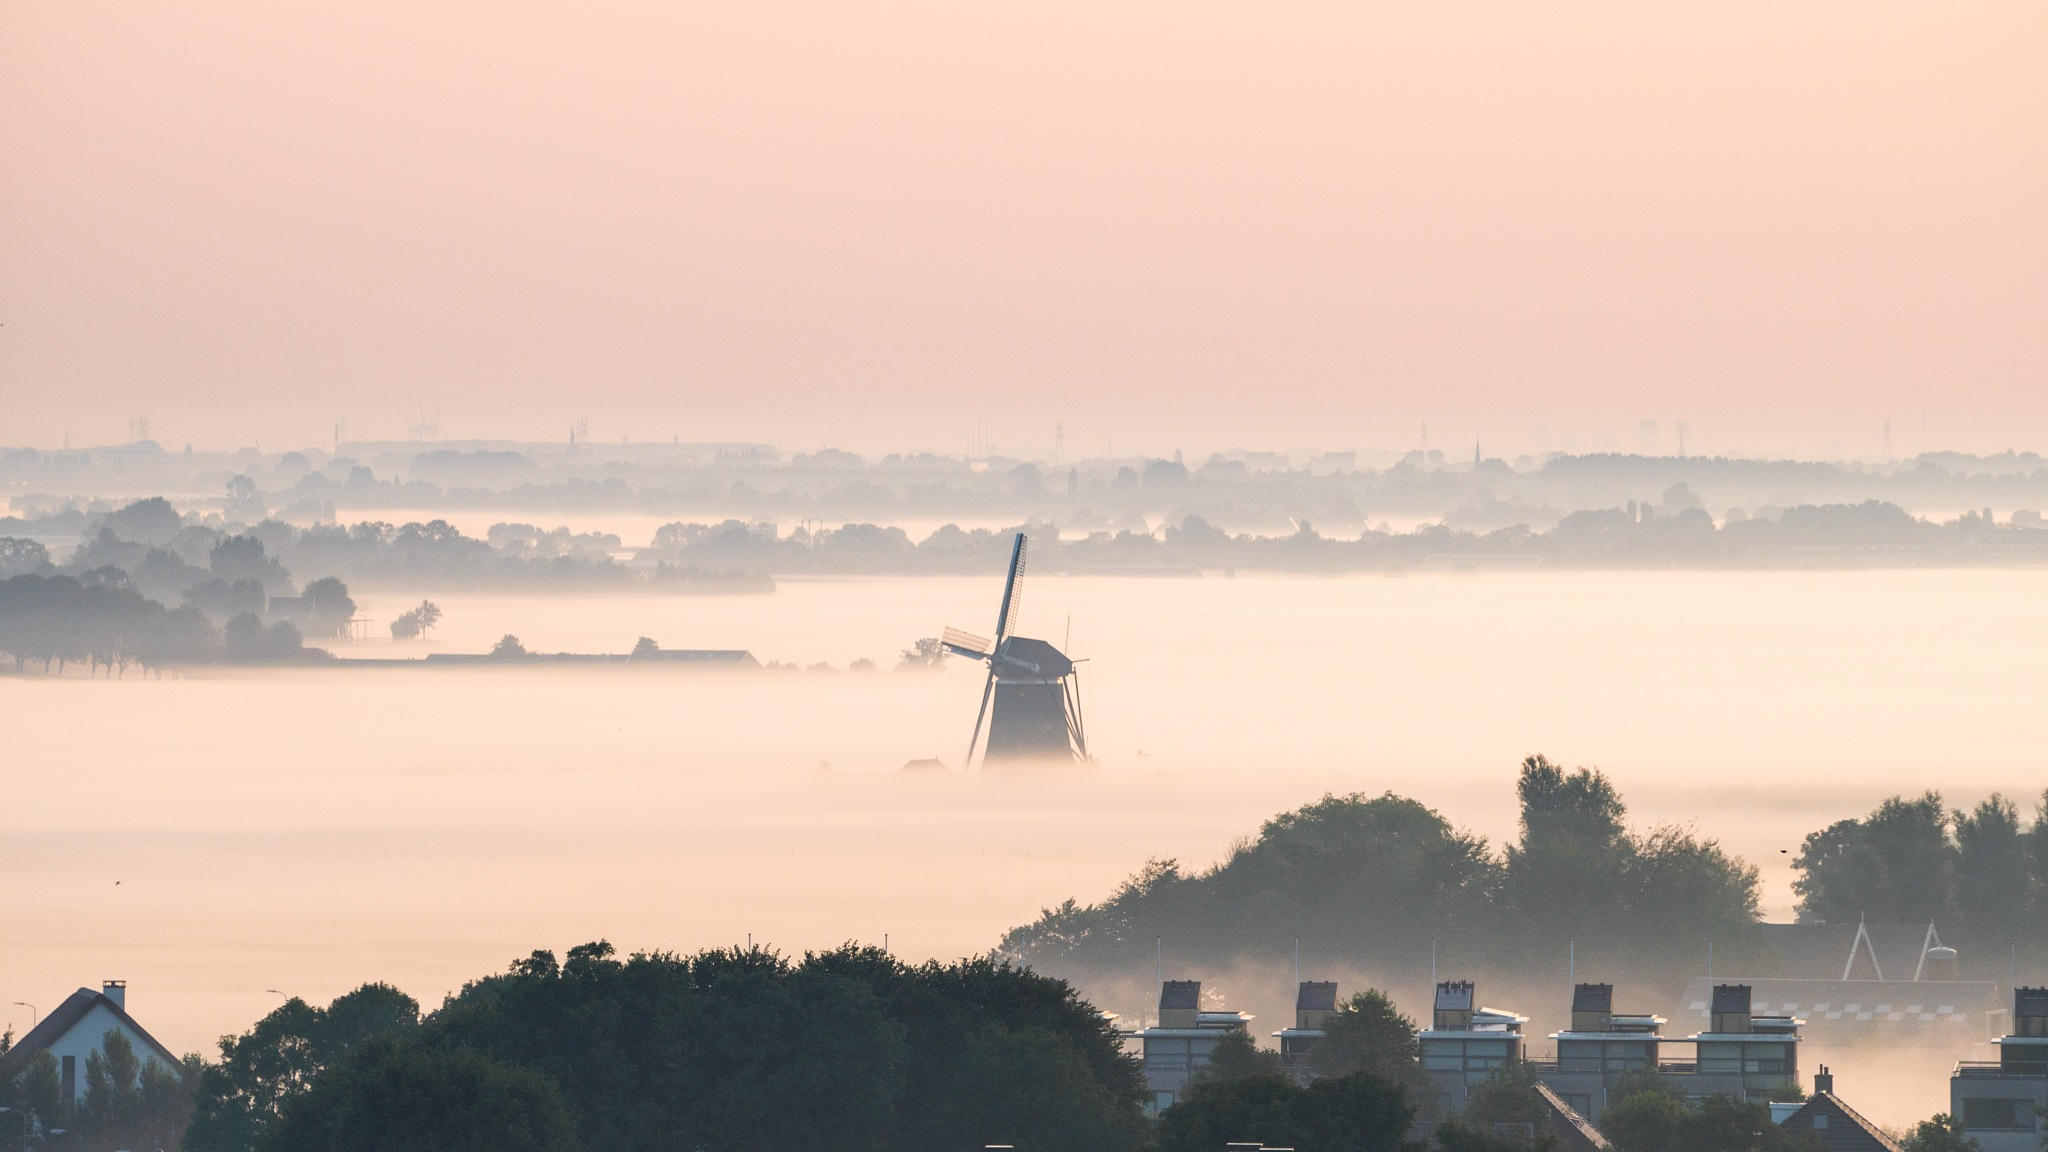 Mill in the mist by Jos van der Zon